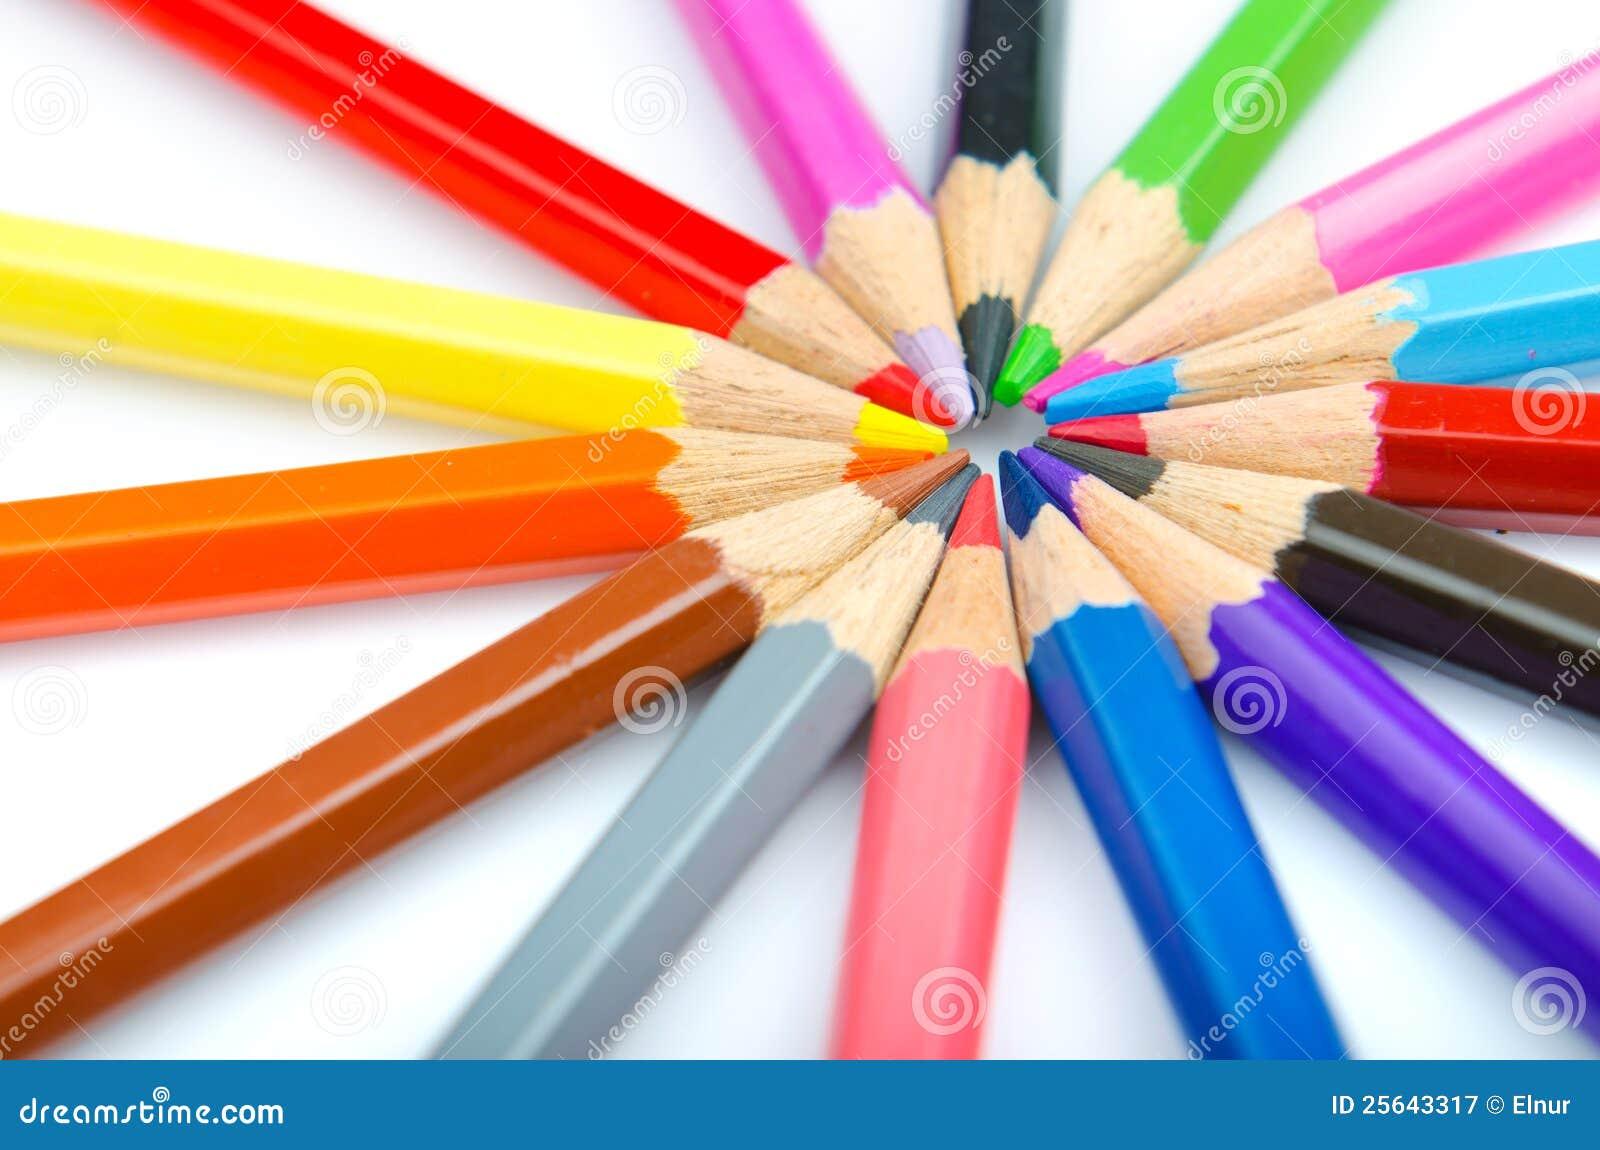 Colour pencils - creativity concept